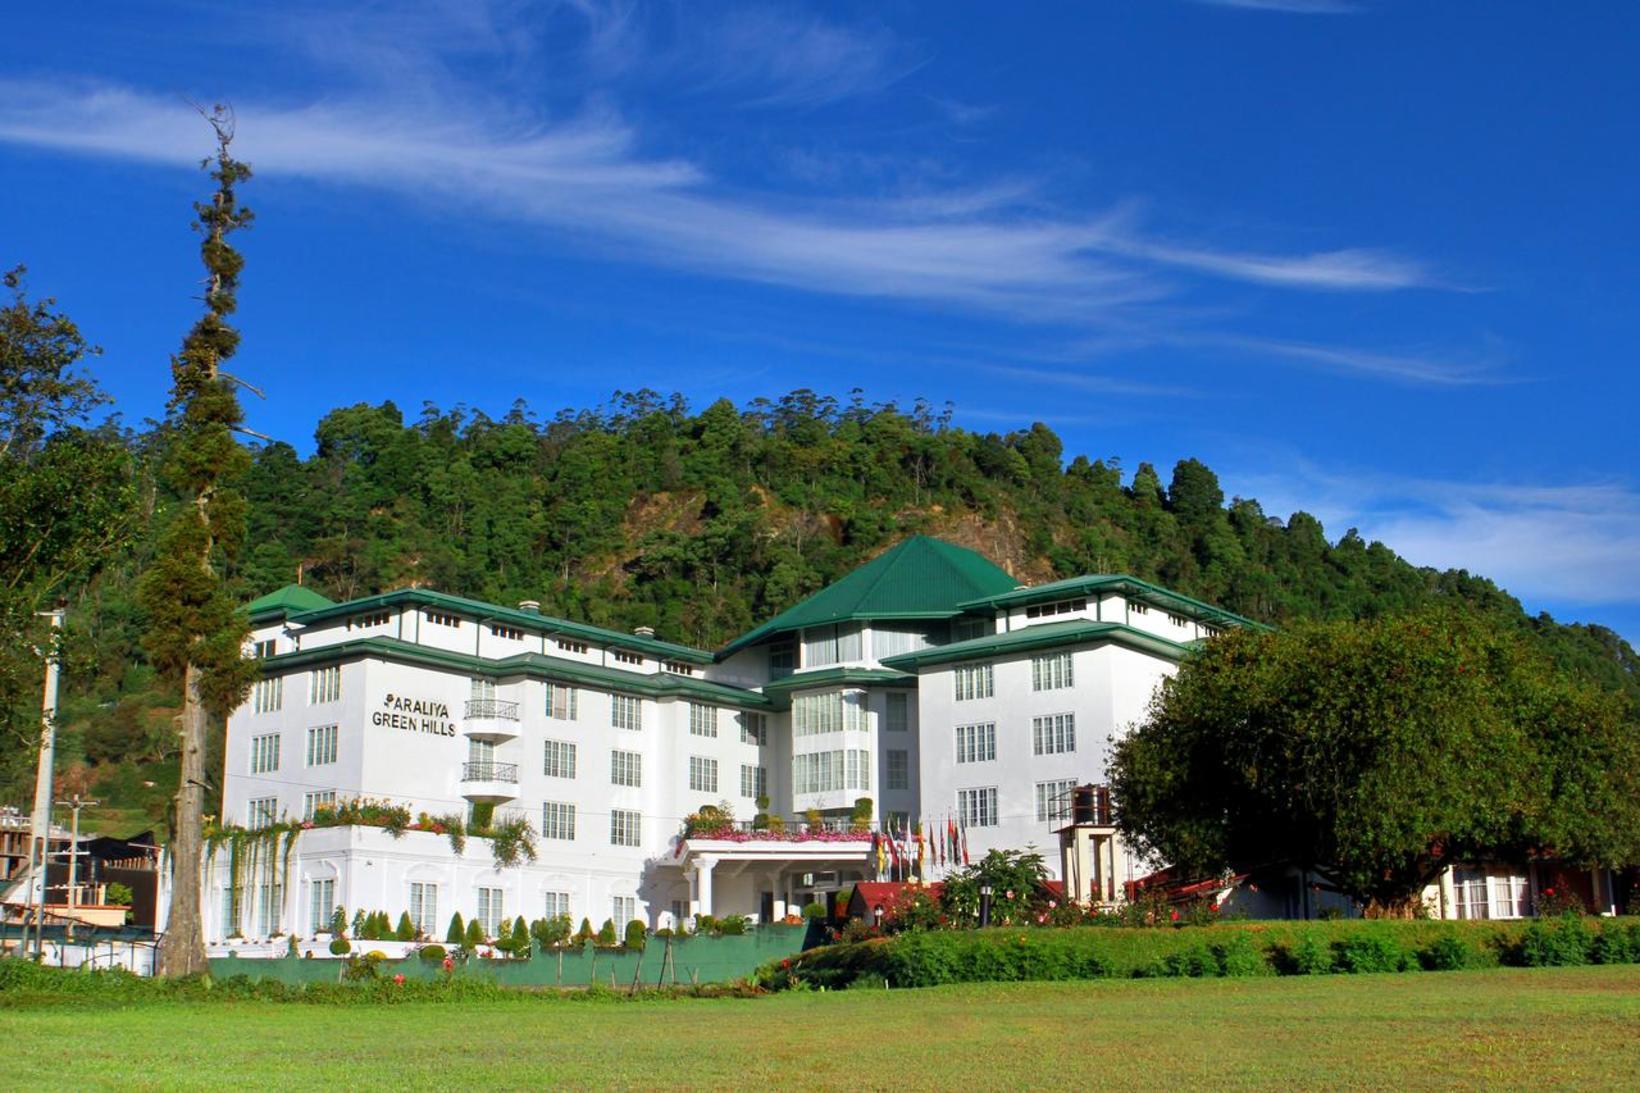 Araliya Green Hills Hotel, Nuwara Eliya